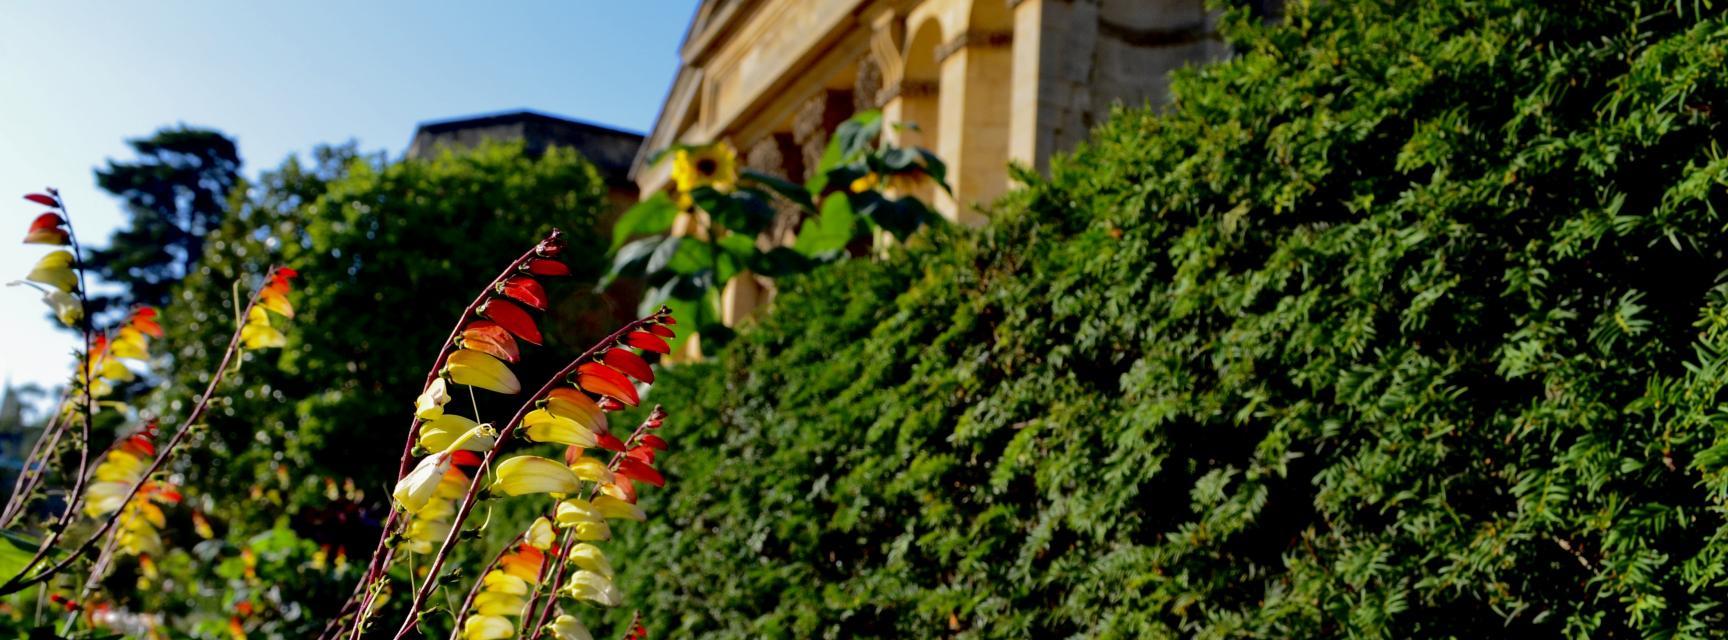 Visit The Oxford Botanic Garden